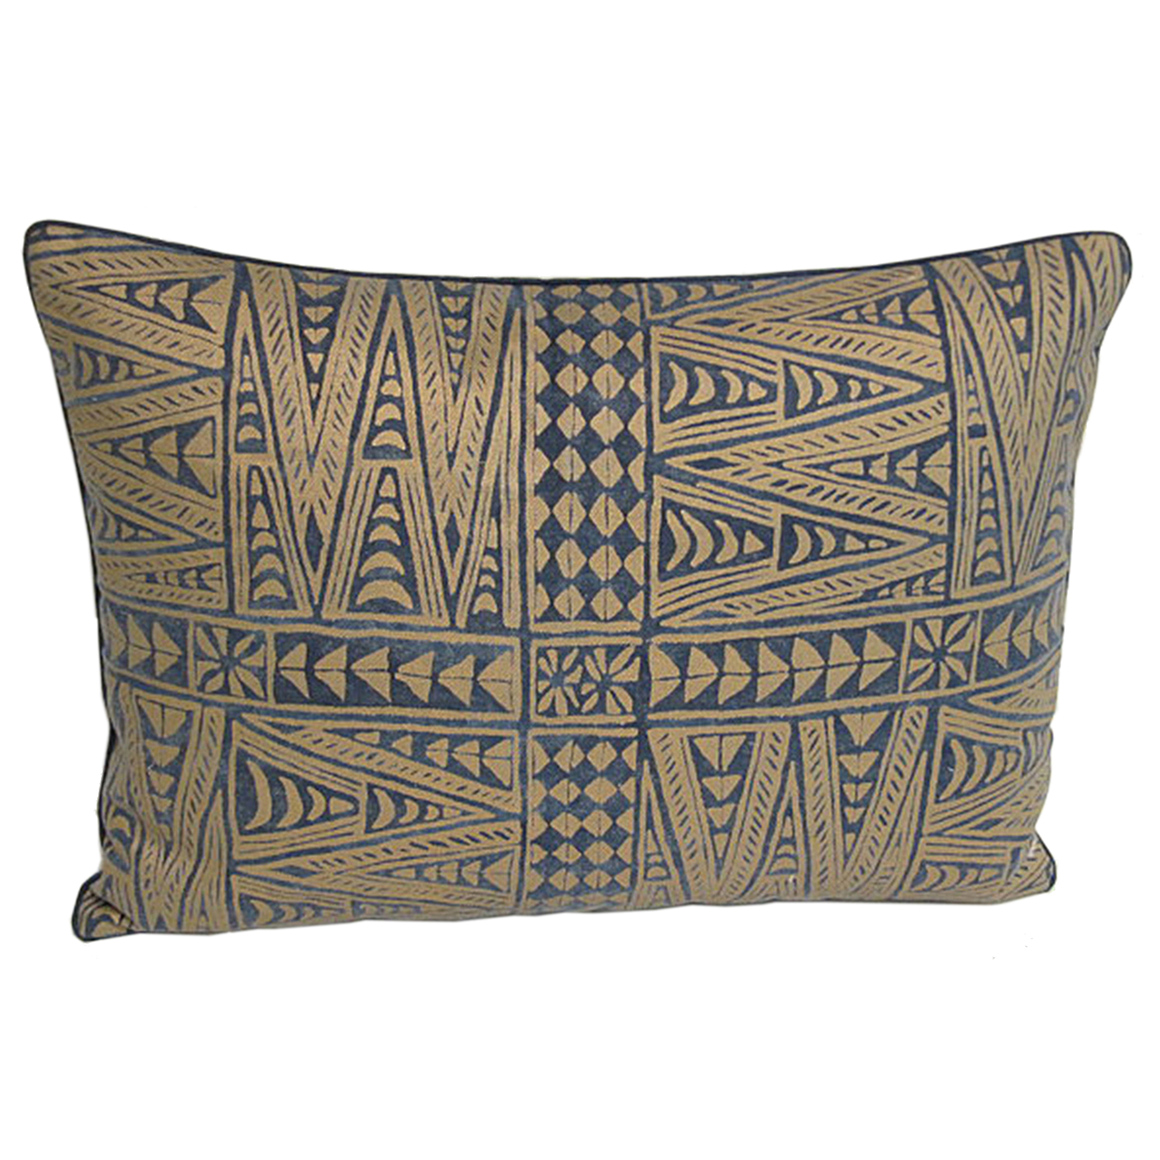 Satin Pillowcase Dublin: Set Of Three Handmade Pillows With An Indigo And